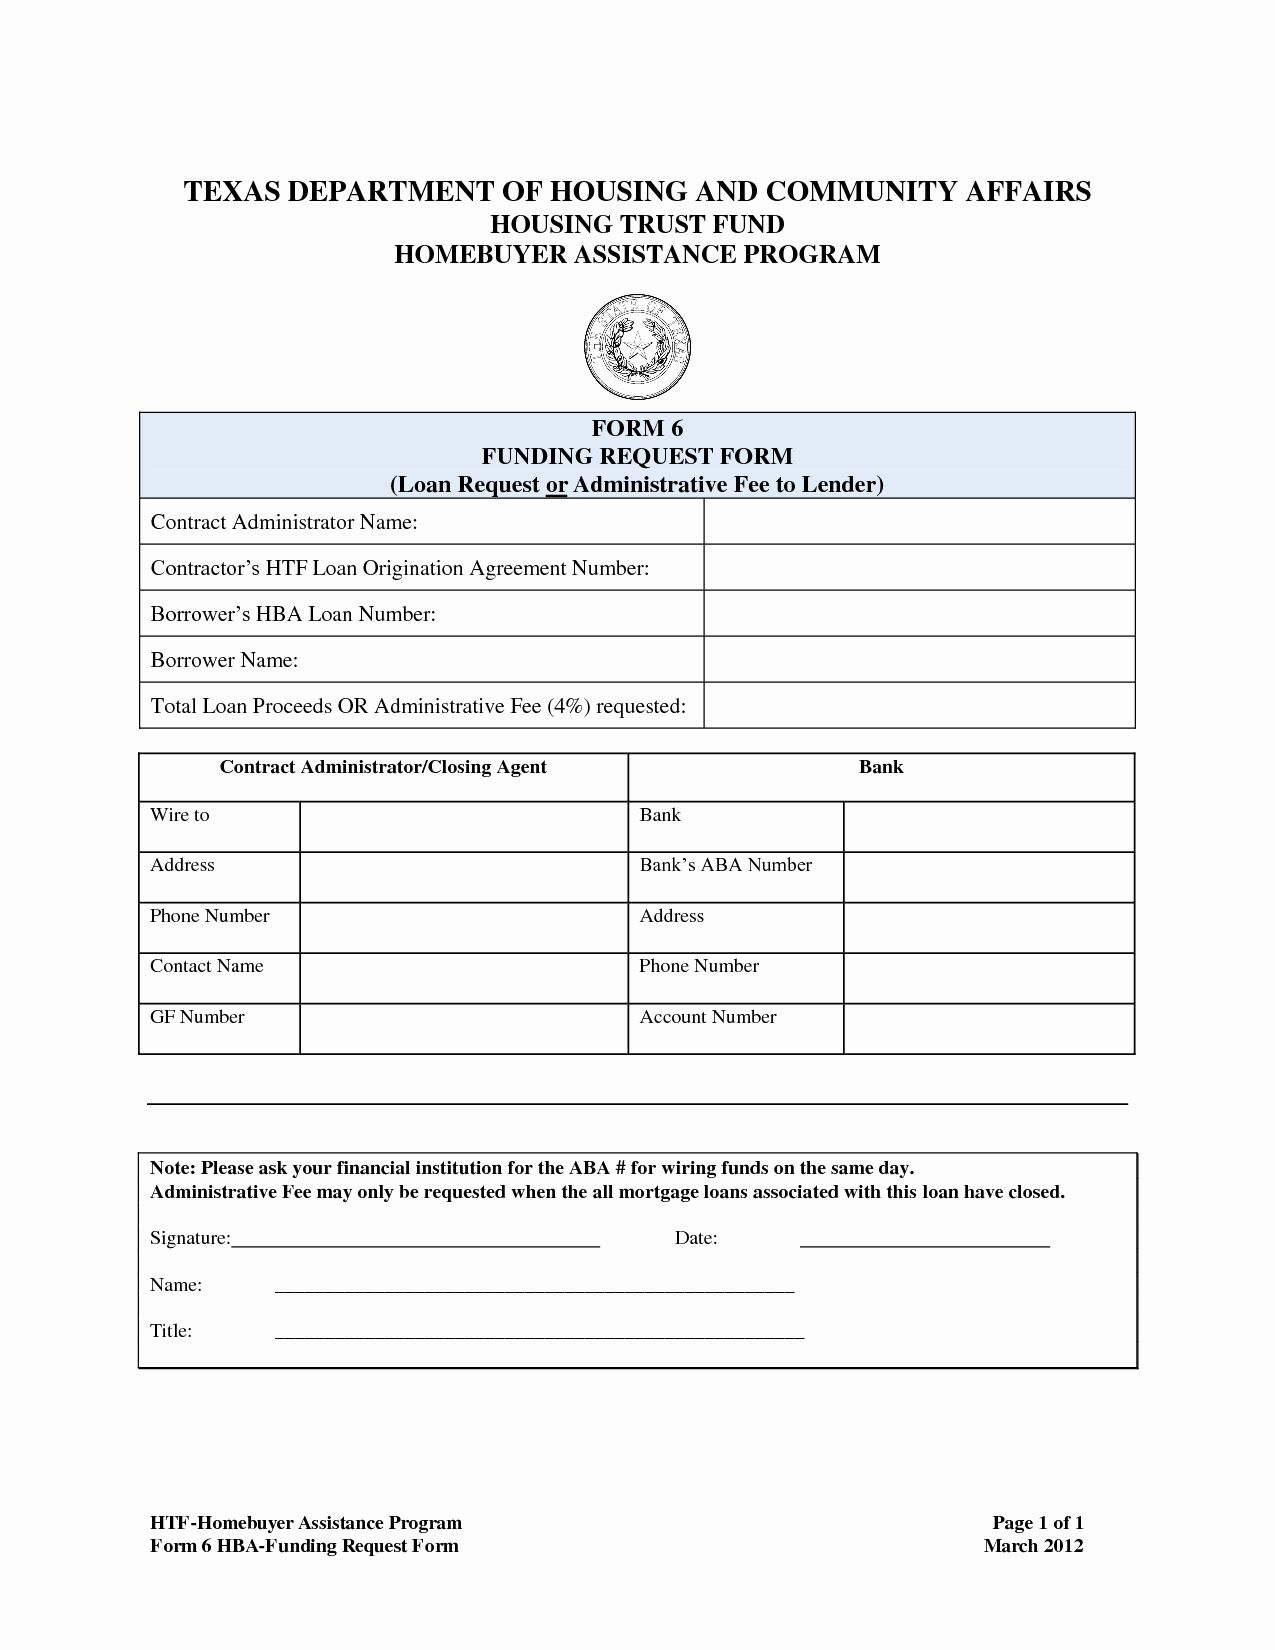 Fund Request Form Template Unique Best S Of Money Request Form Template Refund List Of Jobs Business Proposal Letter Templates